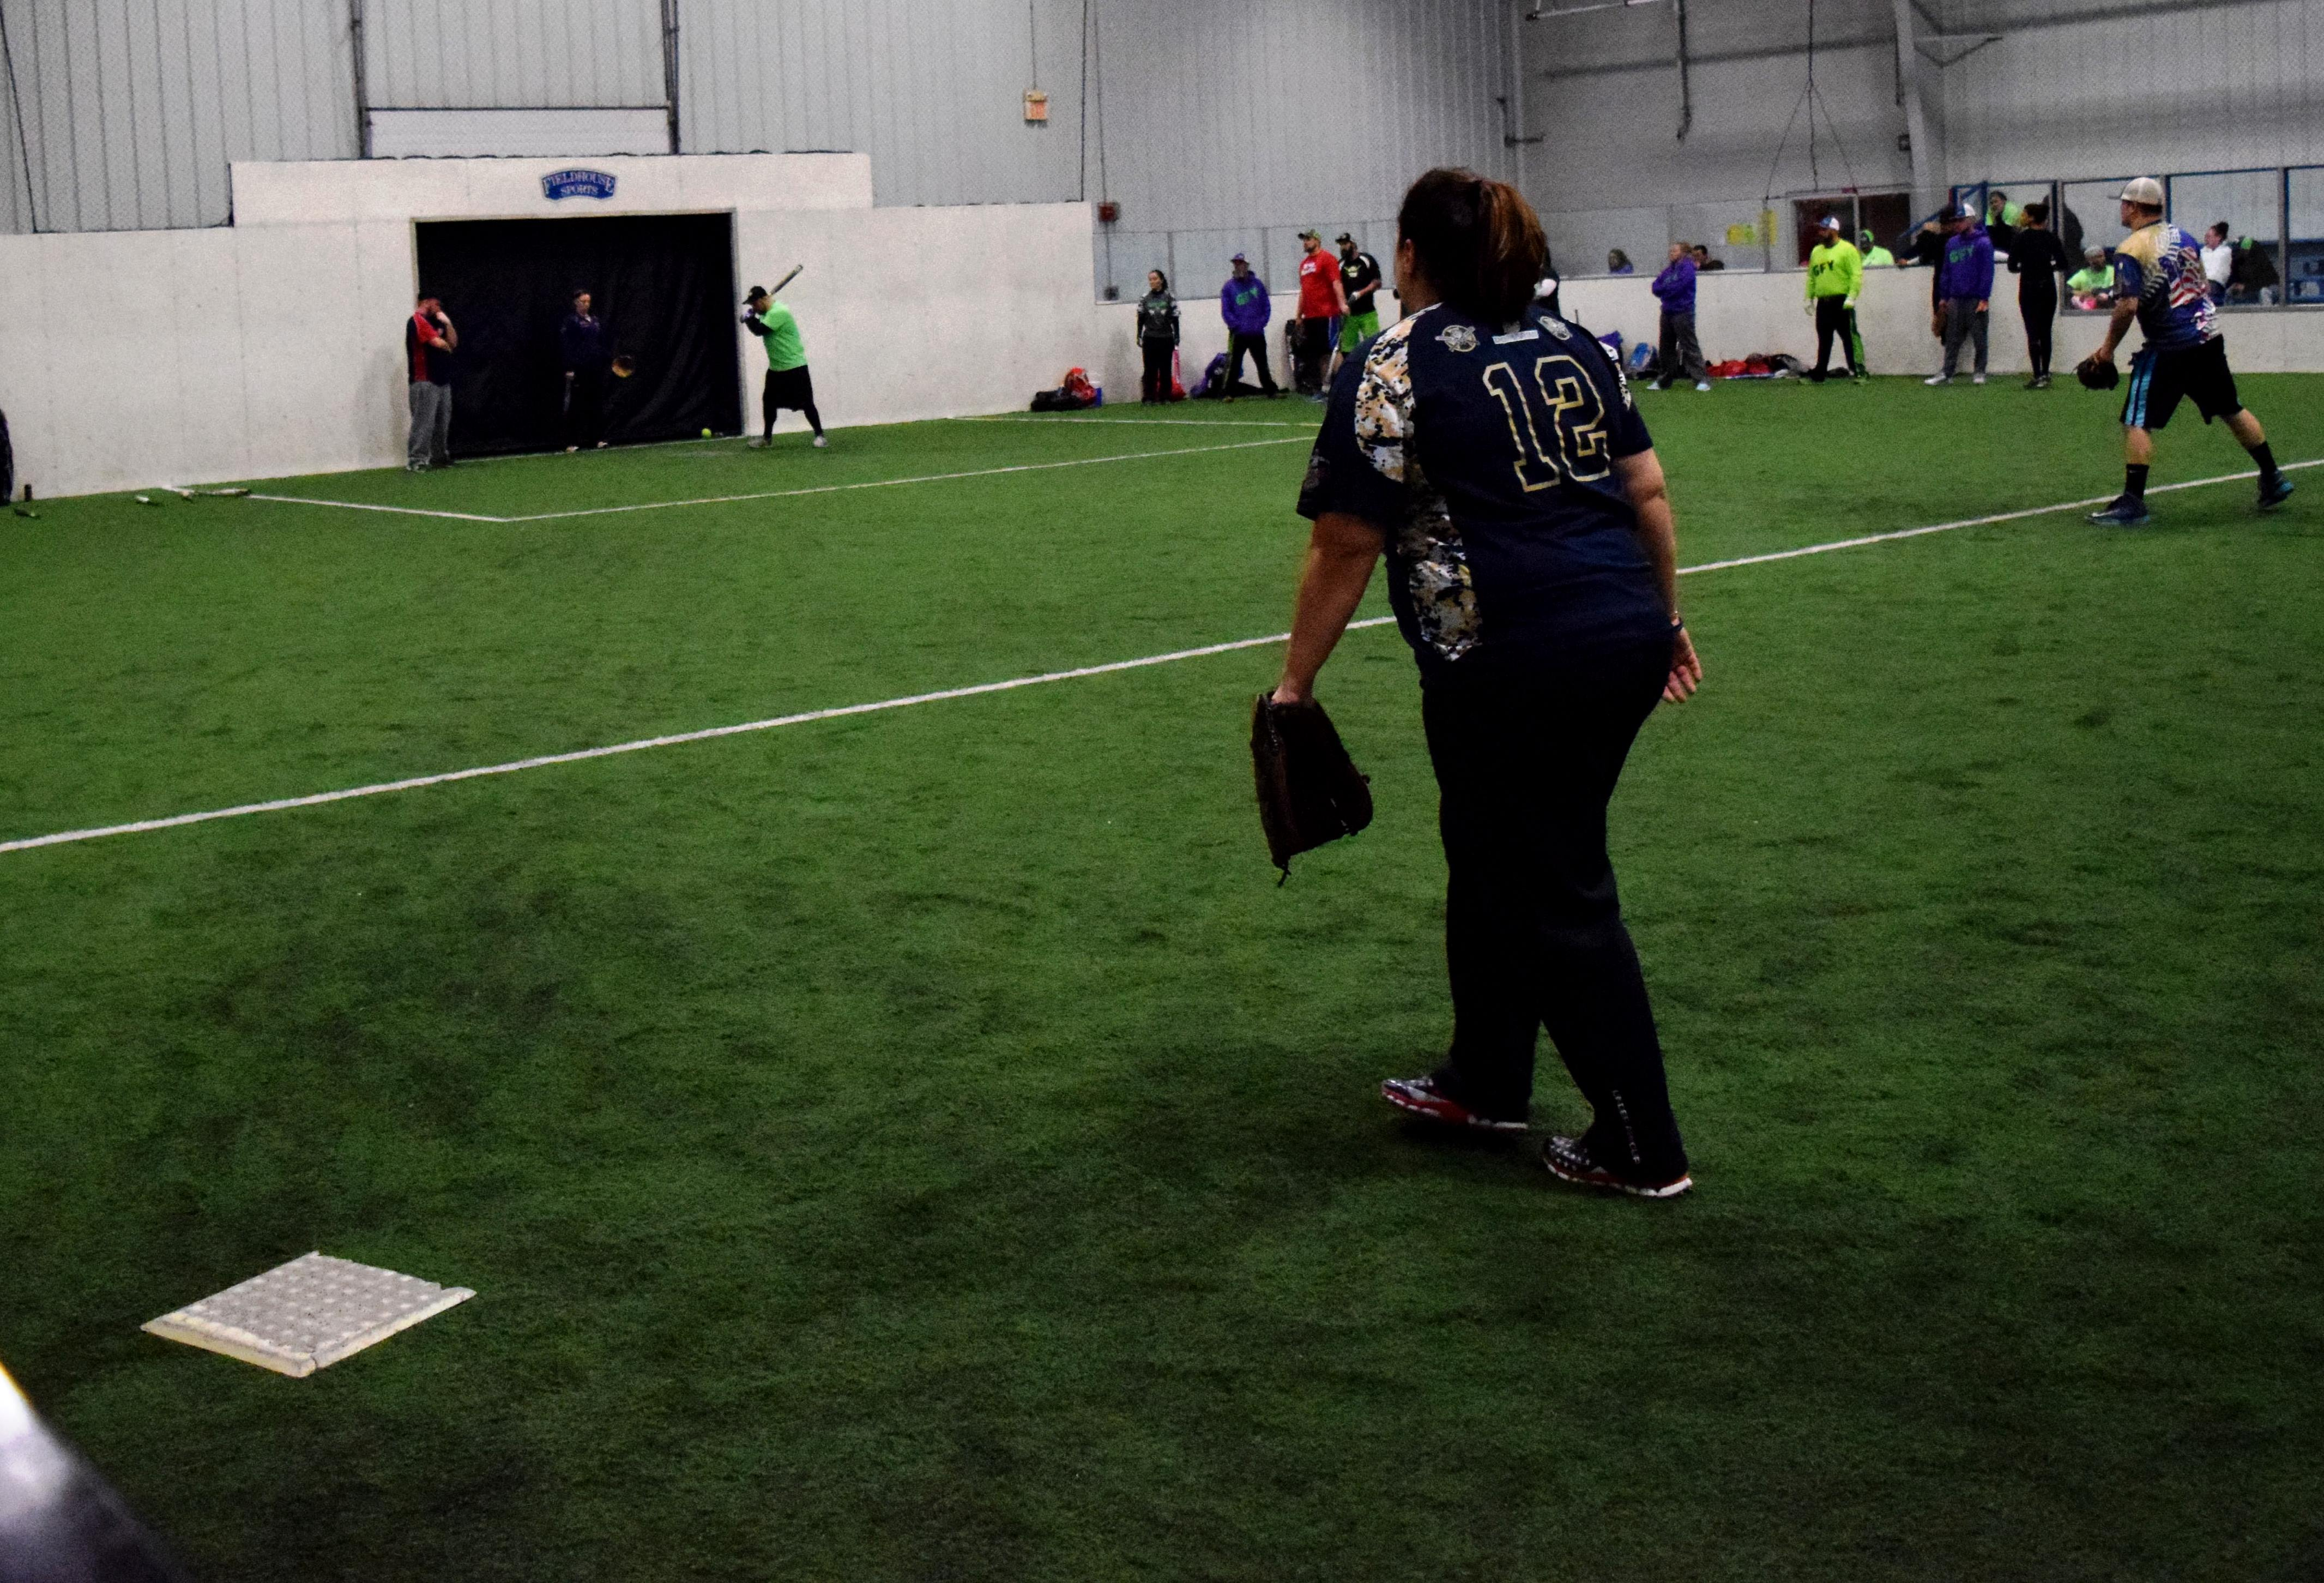 Softball tournament at FieldHouse